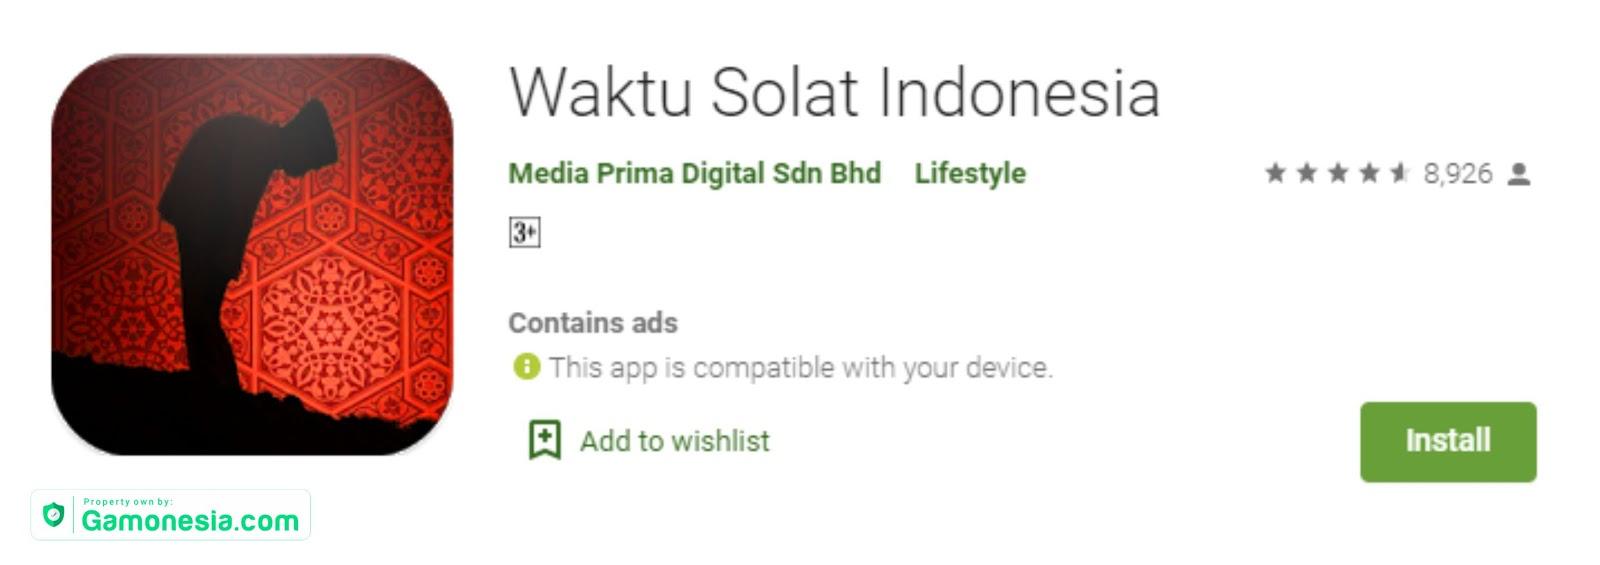 Waktu Solat Indonesia